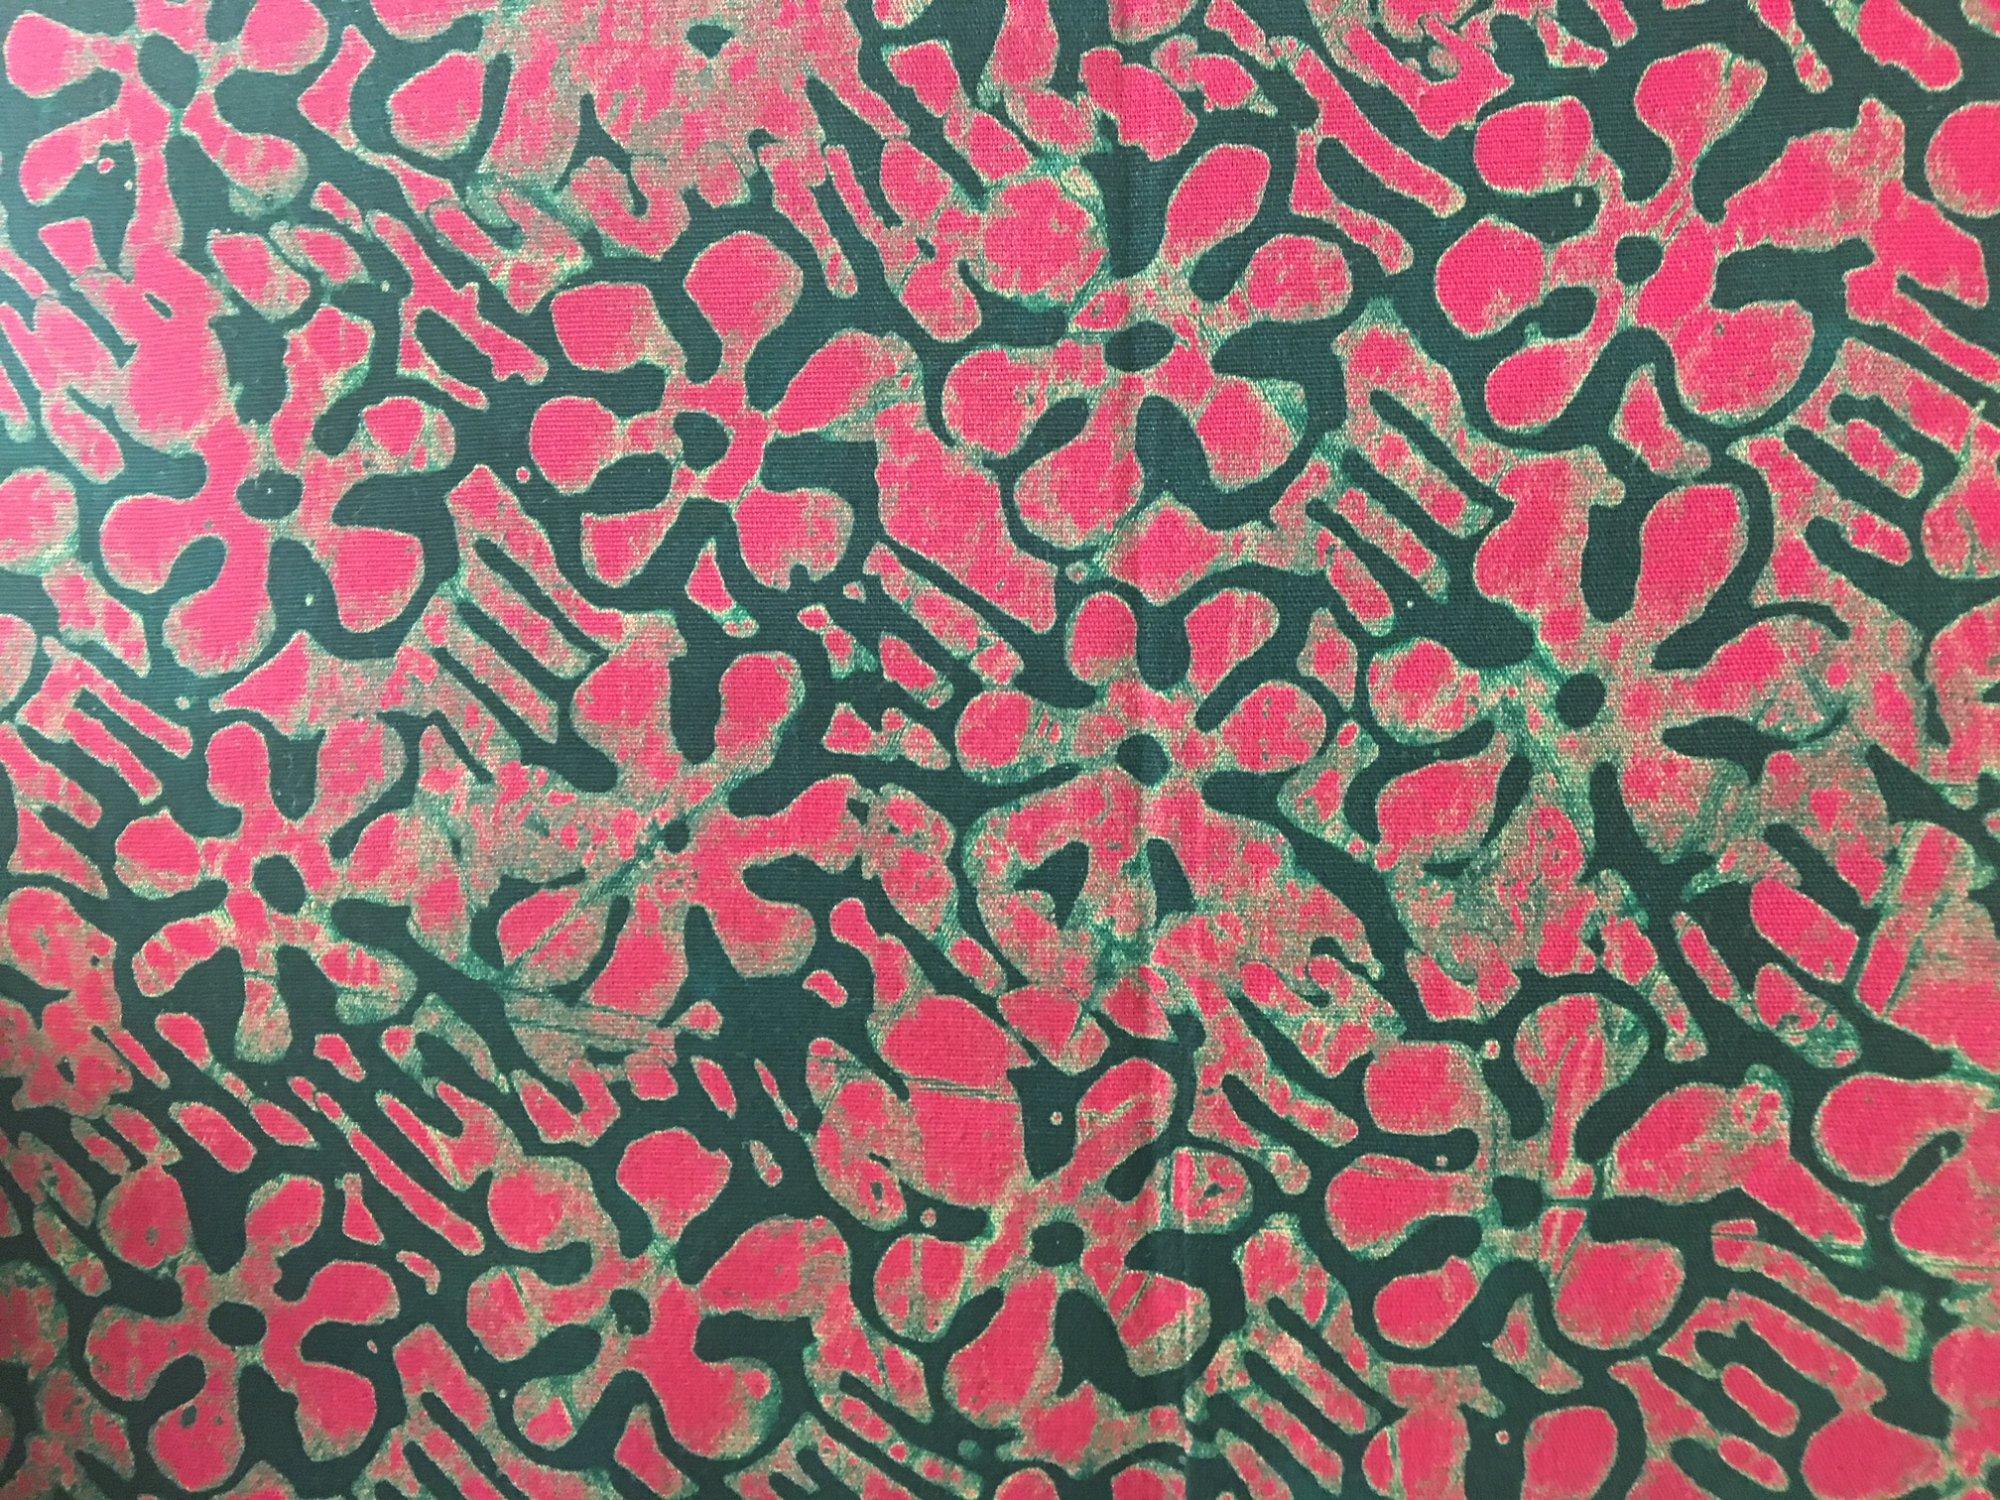 Pink daisy batik R-9